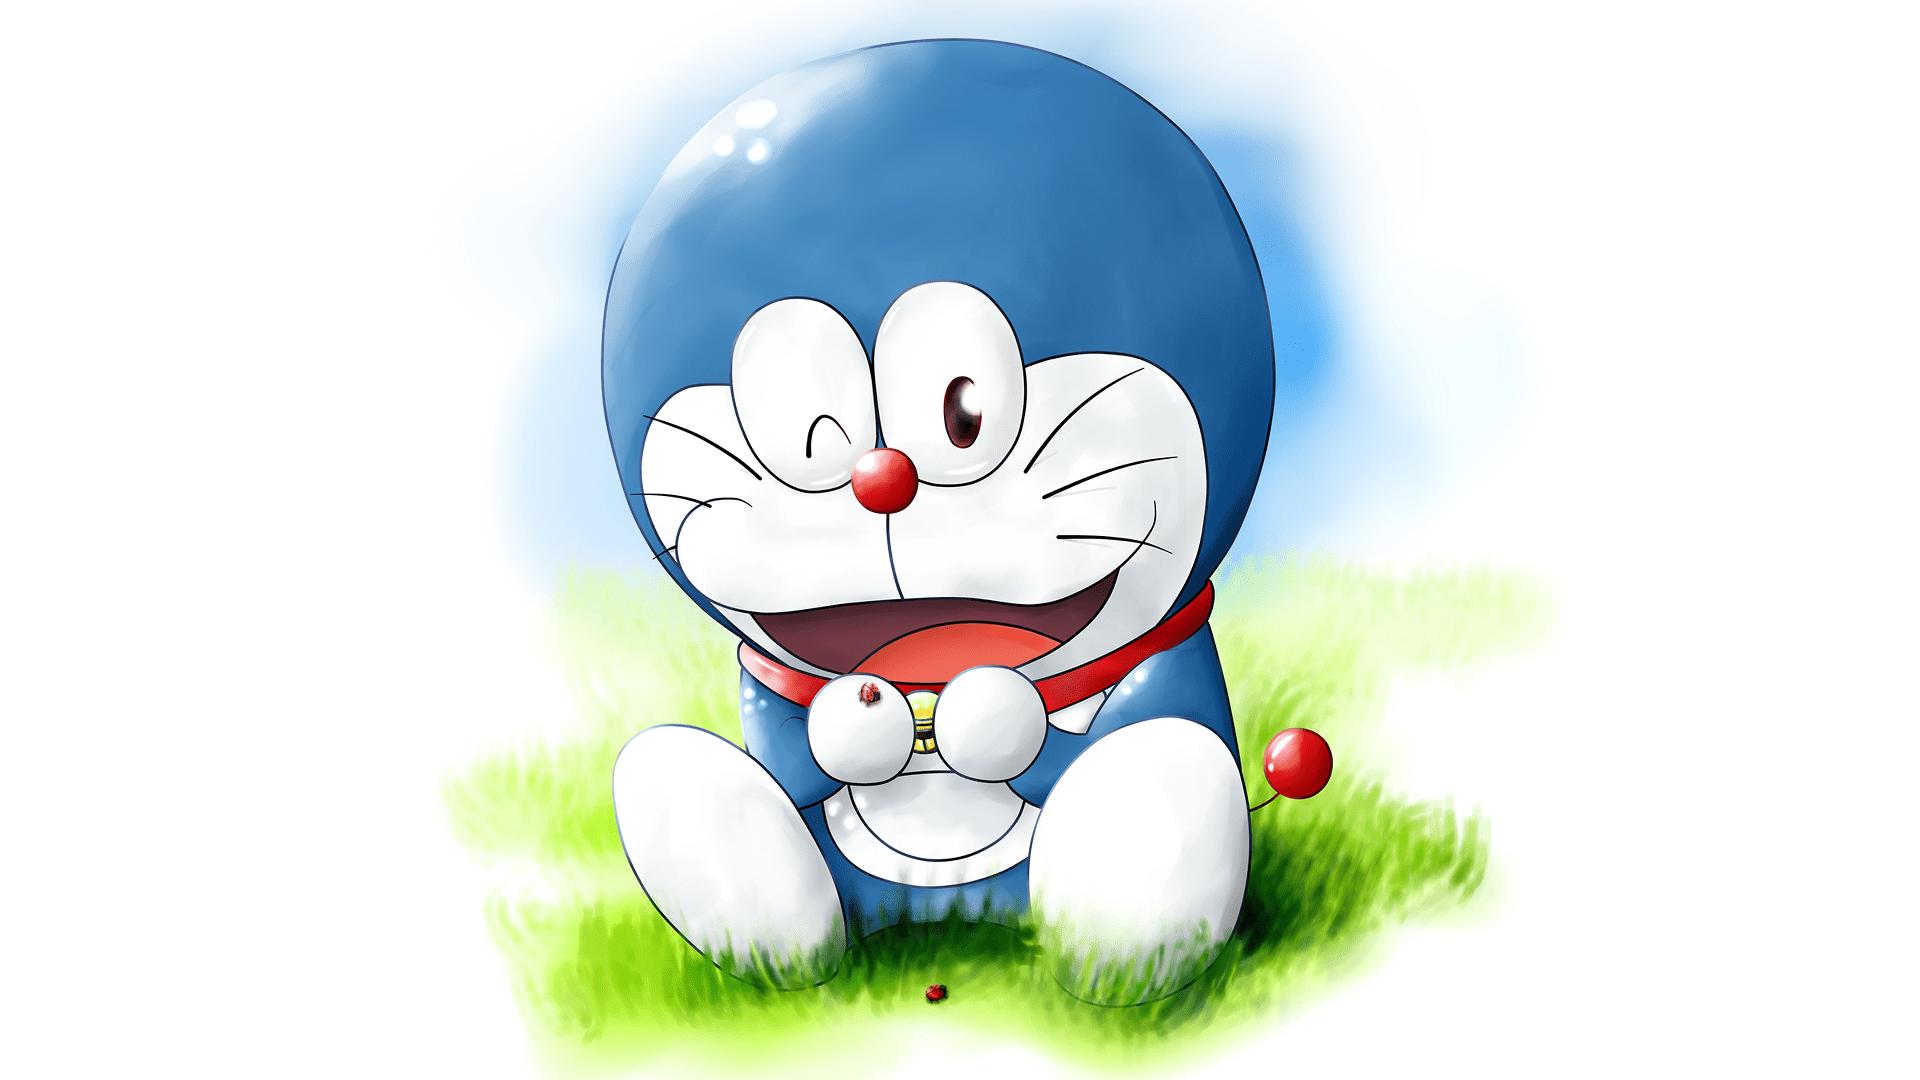 3d Action Game Wallpaper Doraemon Nobita To Yousei No Kuni Details Launchbox